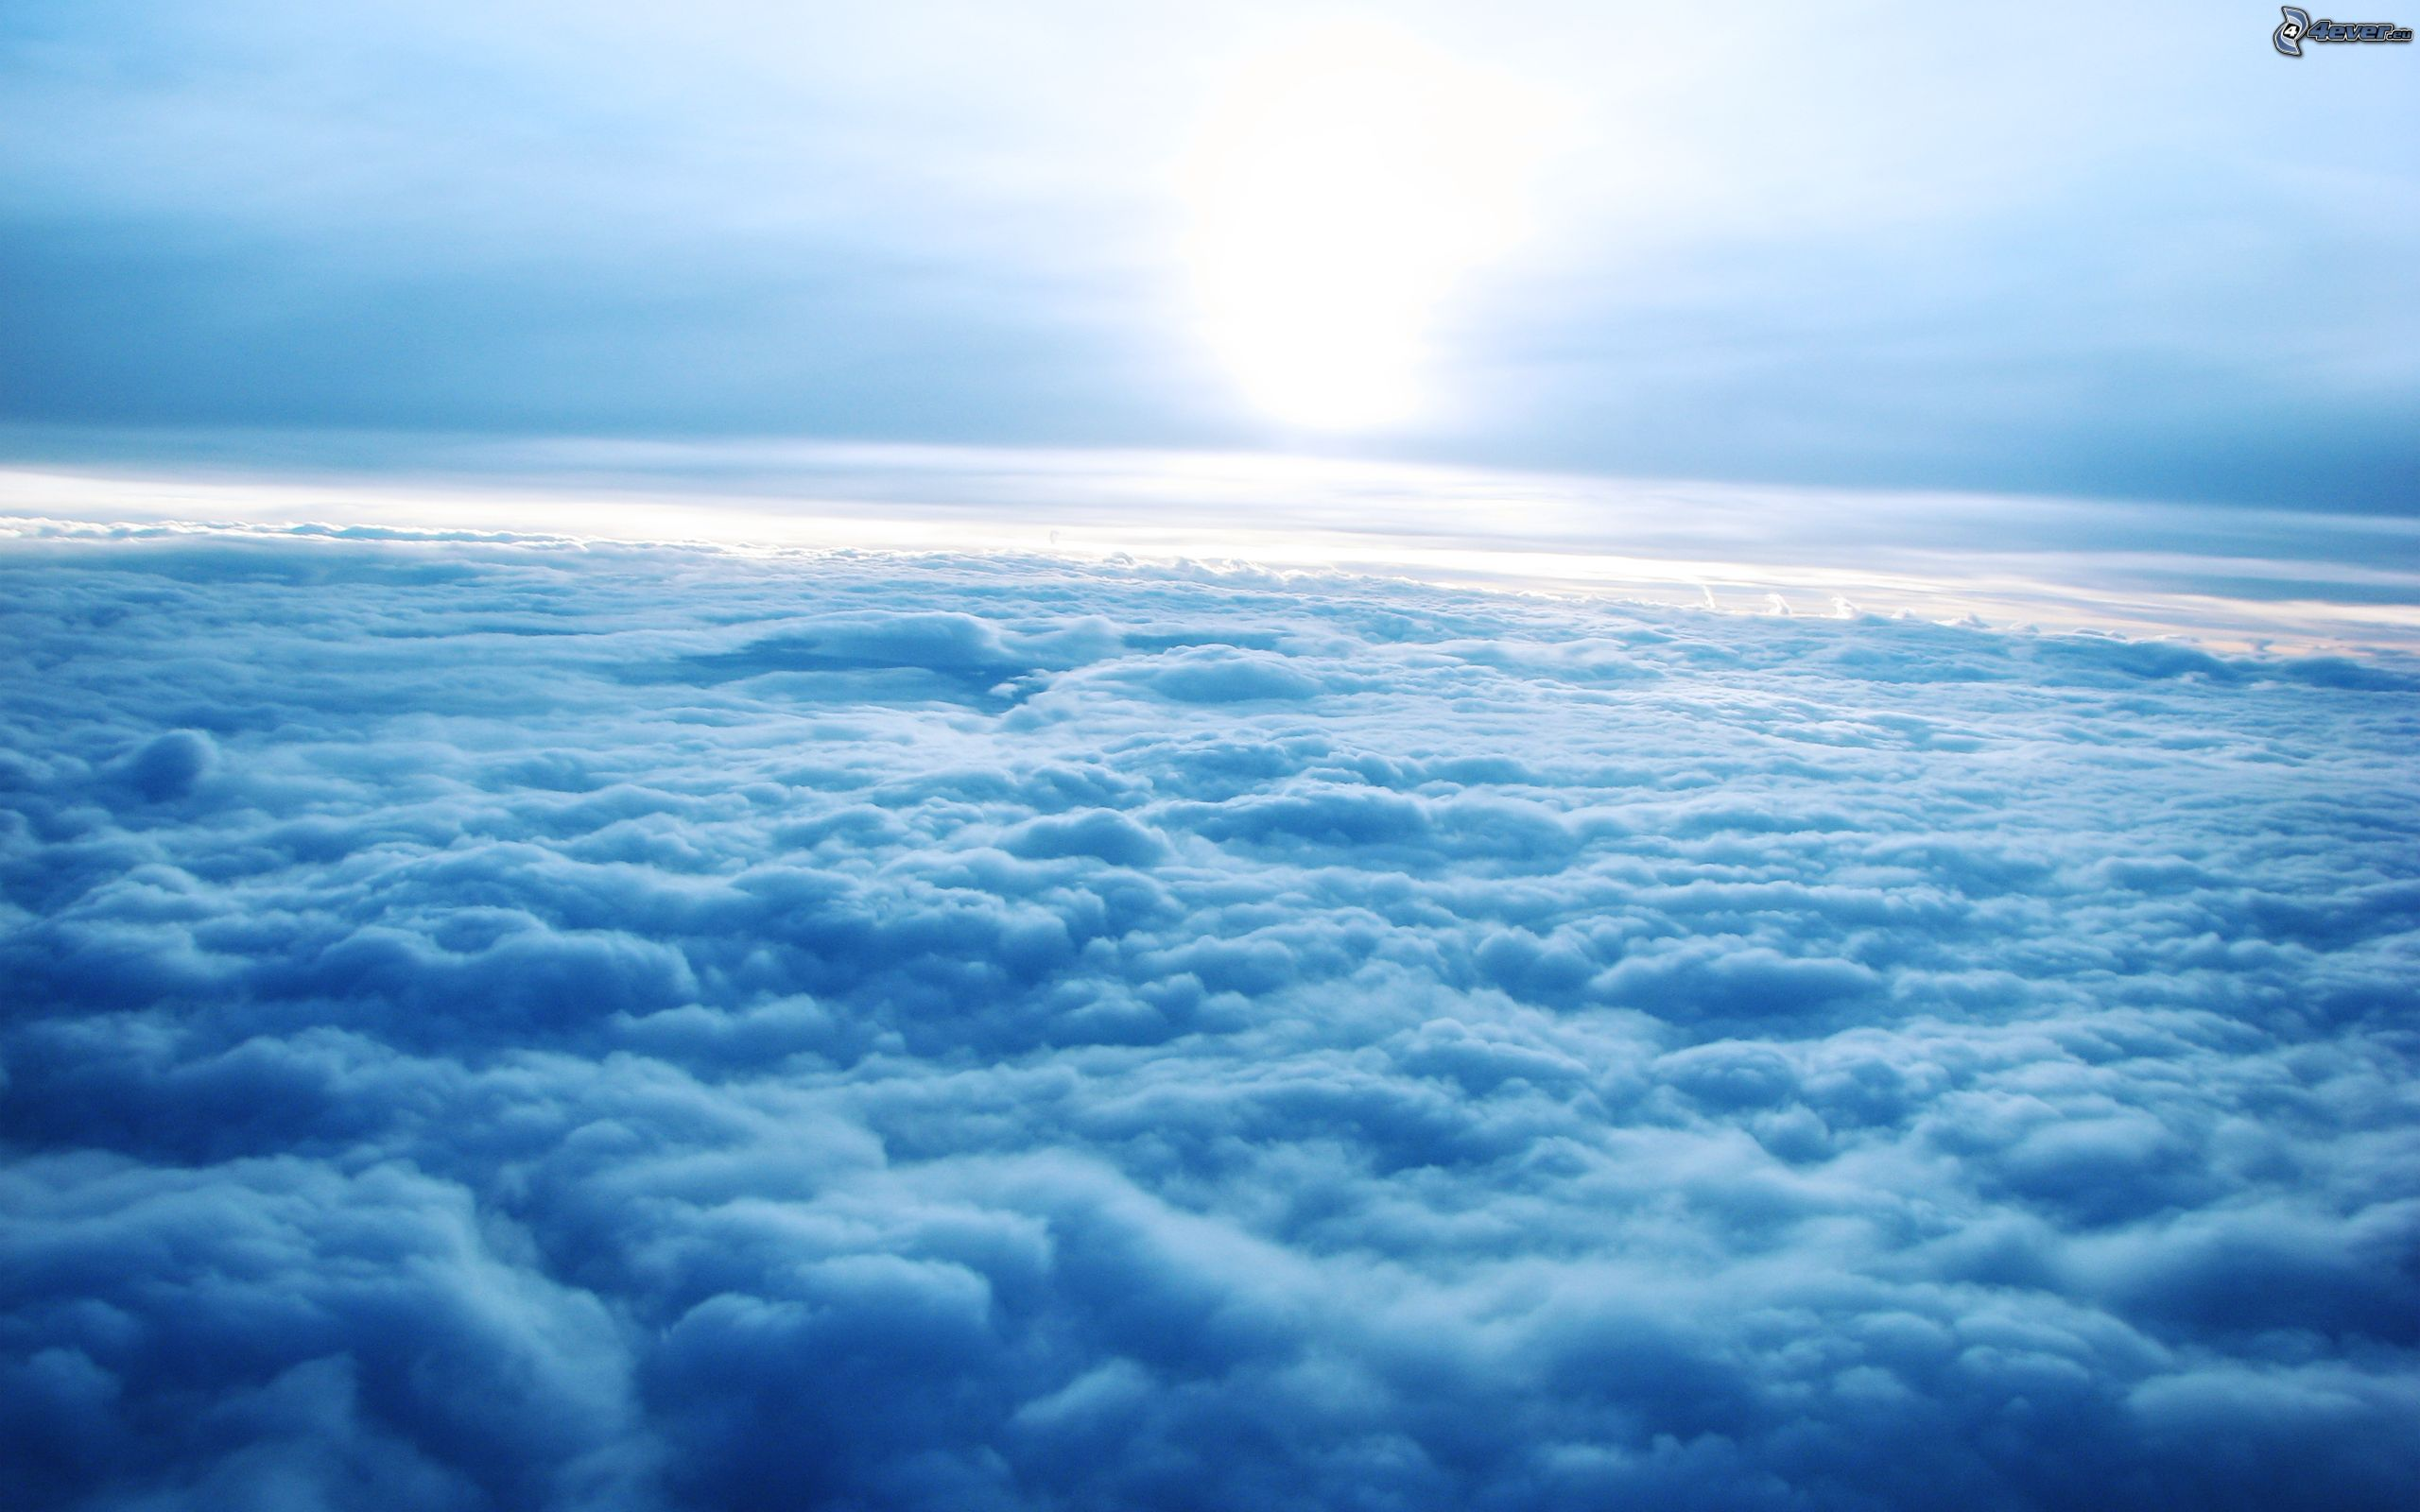 Himmel Wolken Sonne Wallpaper Bild Downloaden